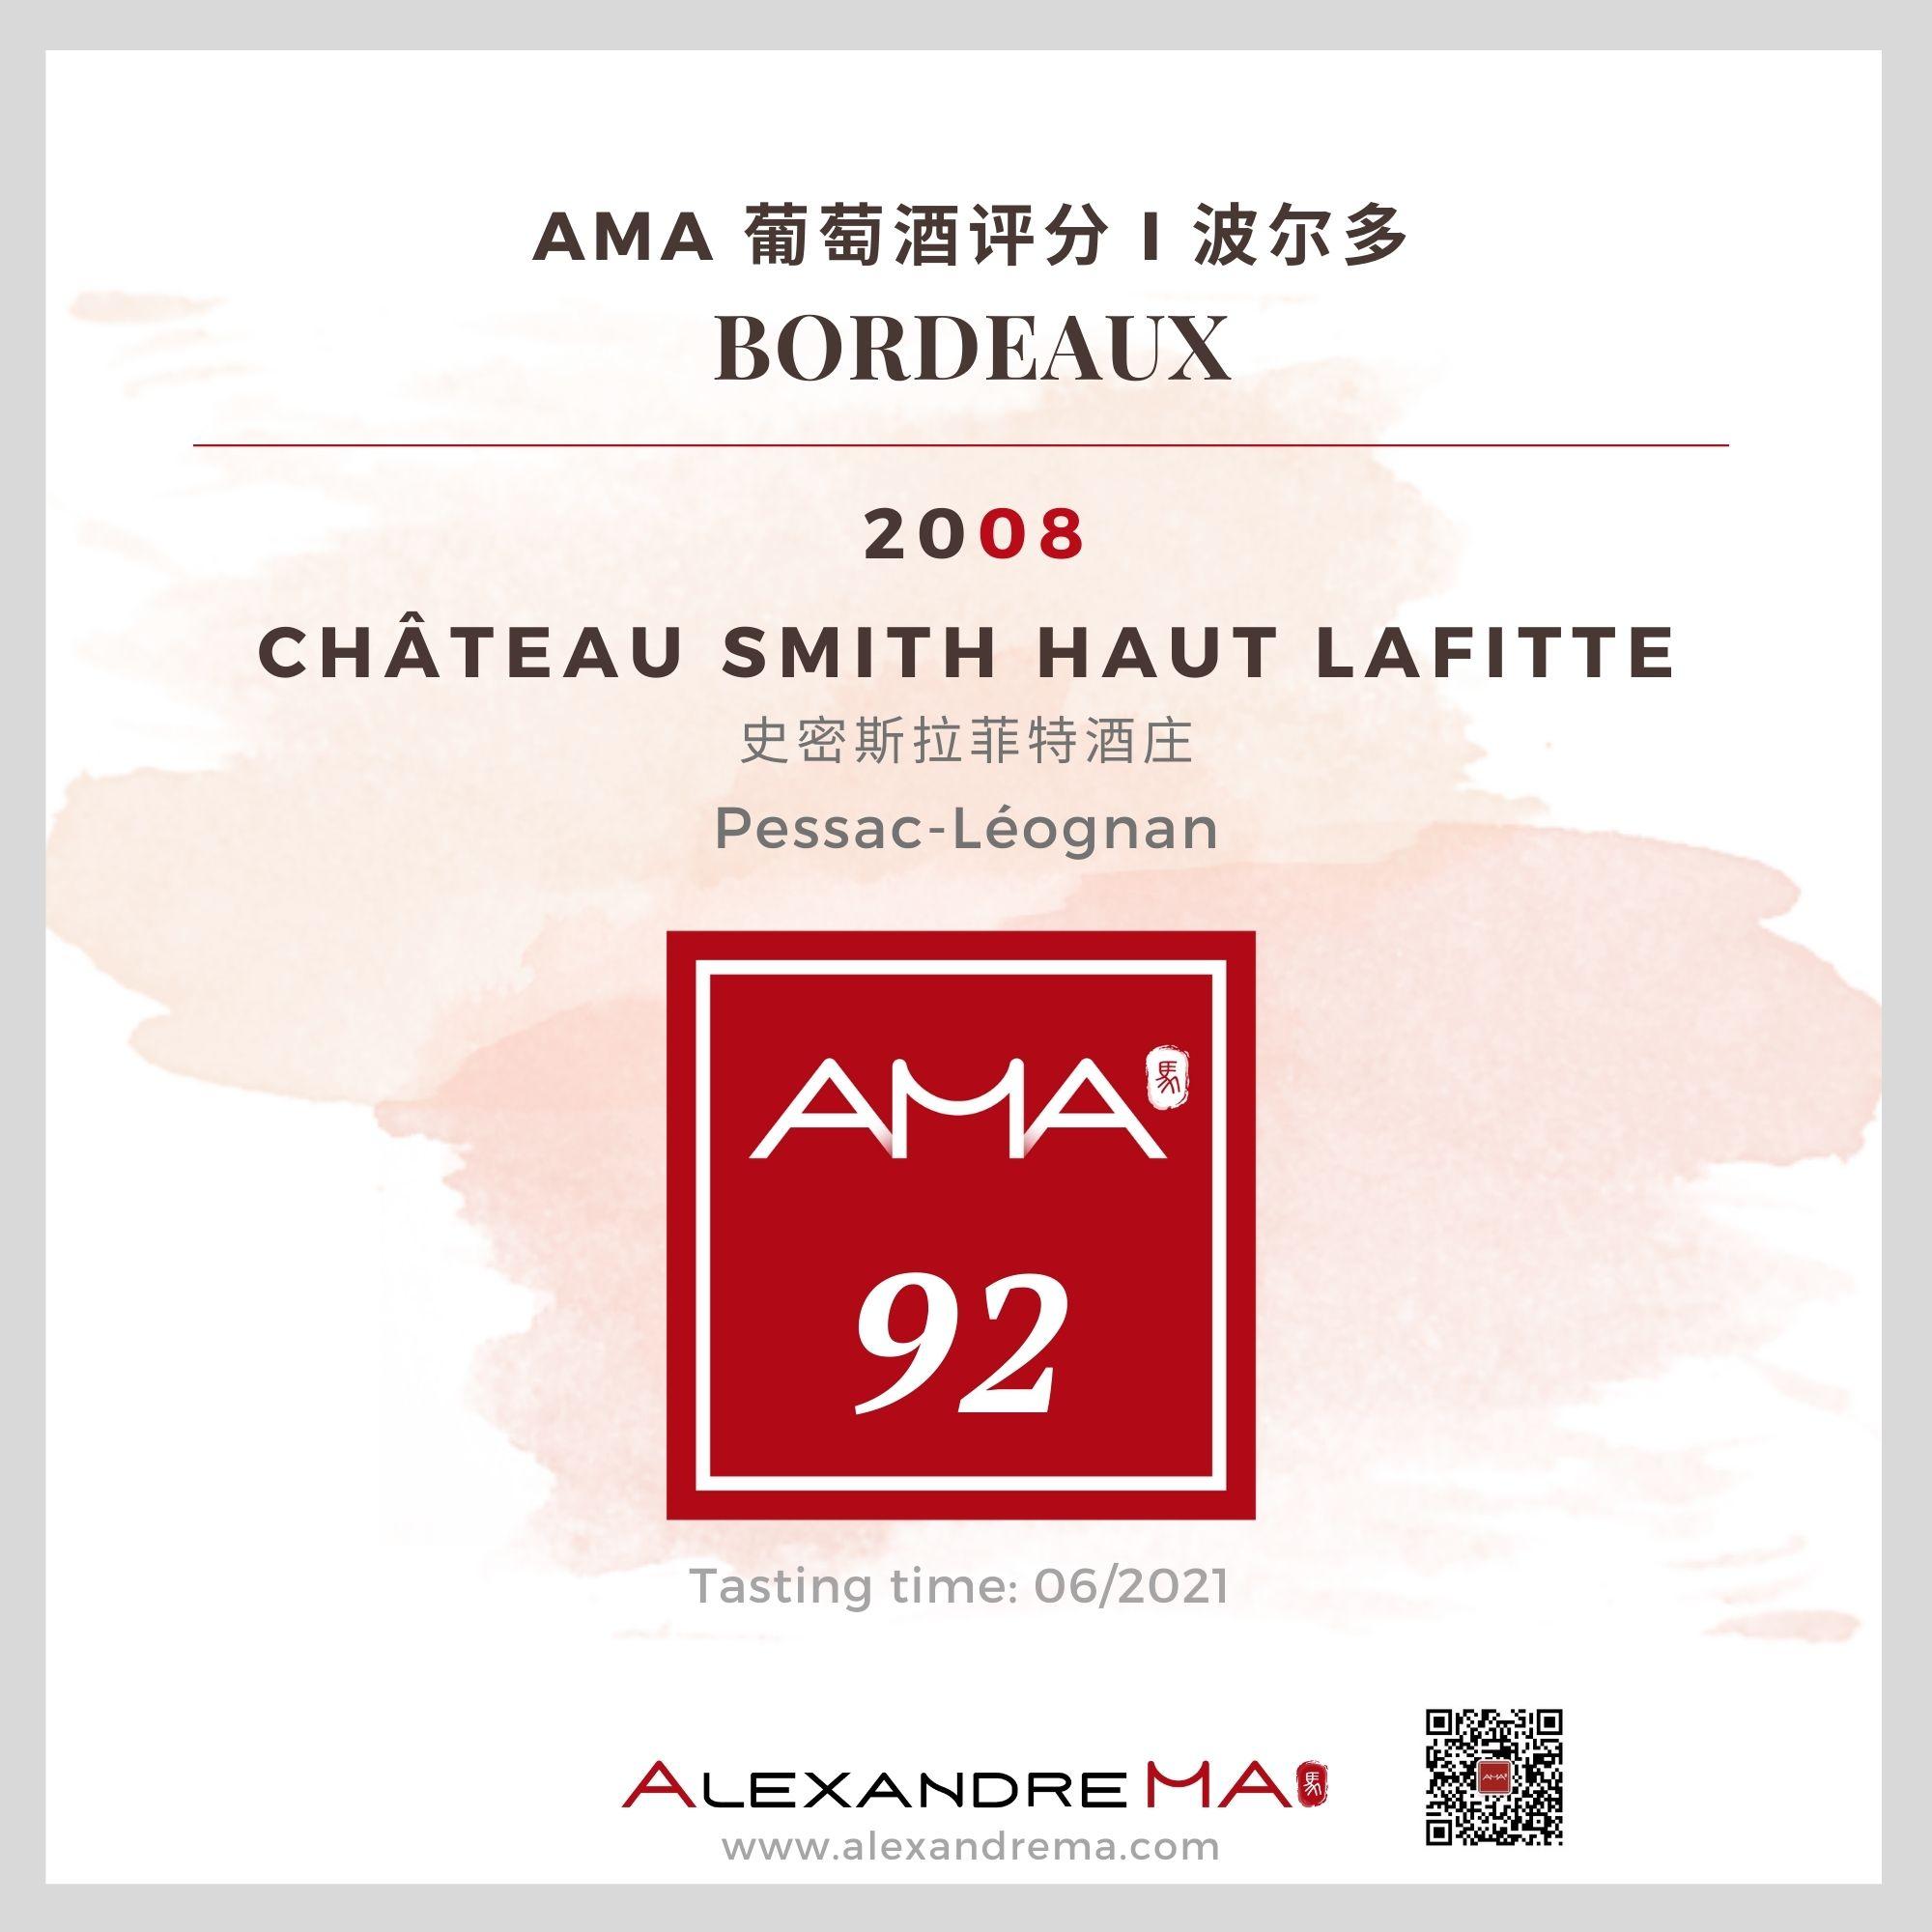 Château Smith Haut Lafitte 2008 史密斯拉菲特酒庄 - Alexandre Ma